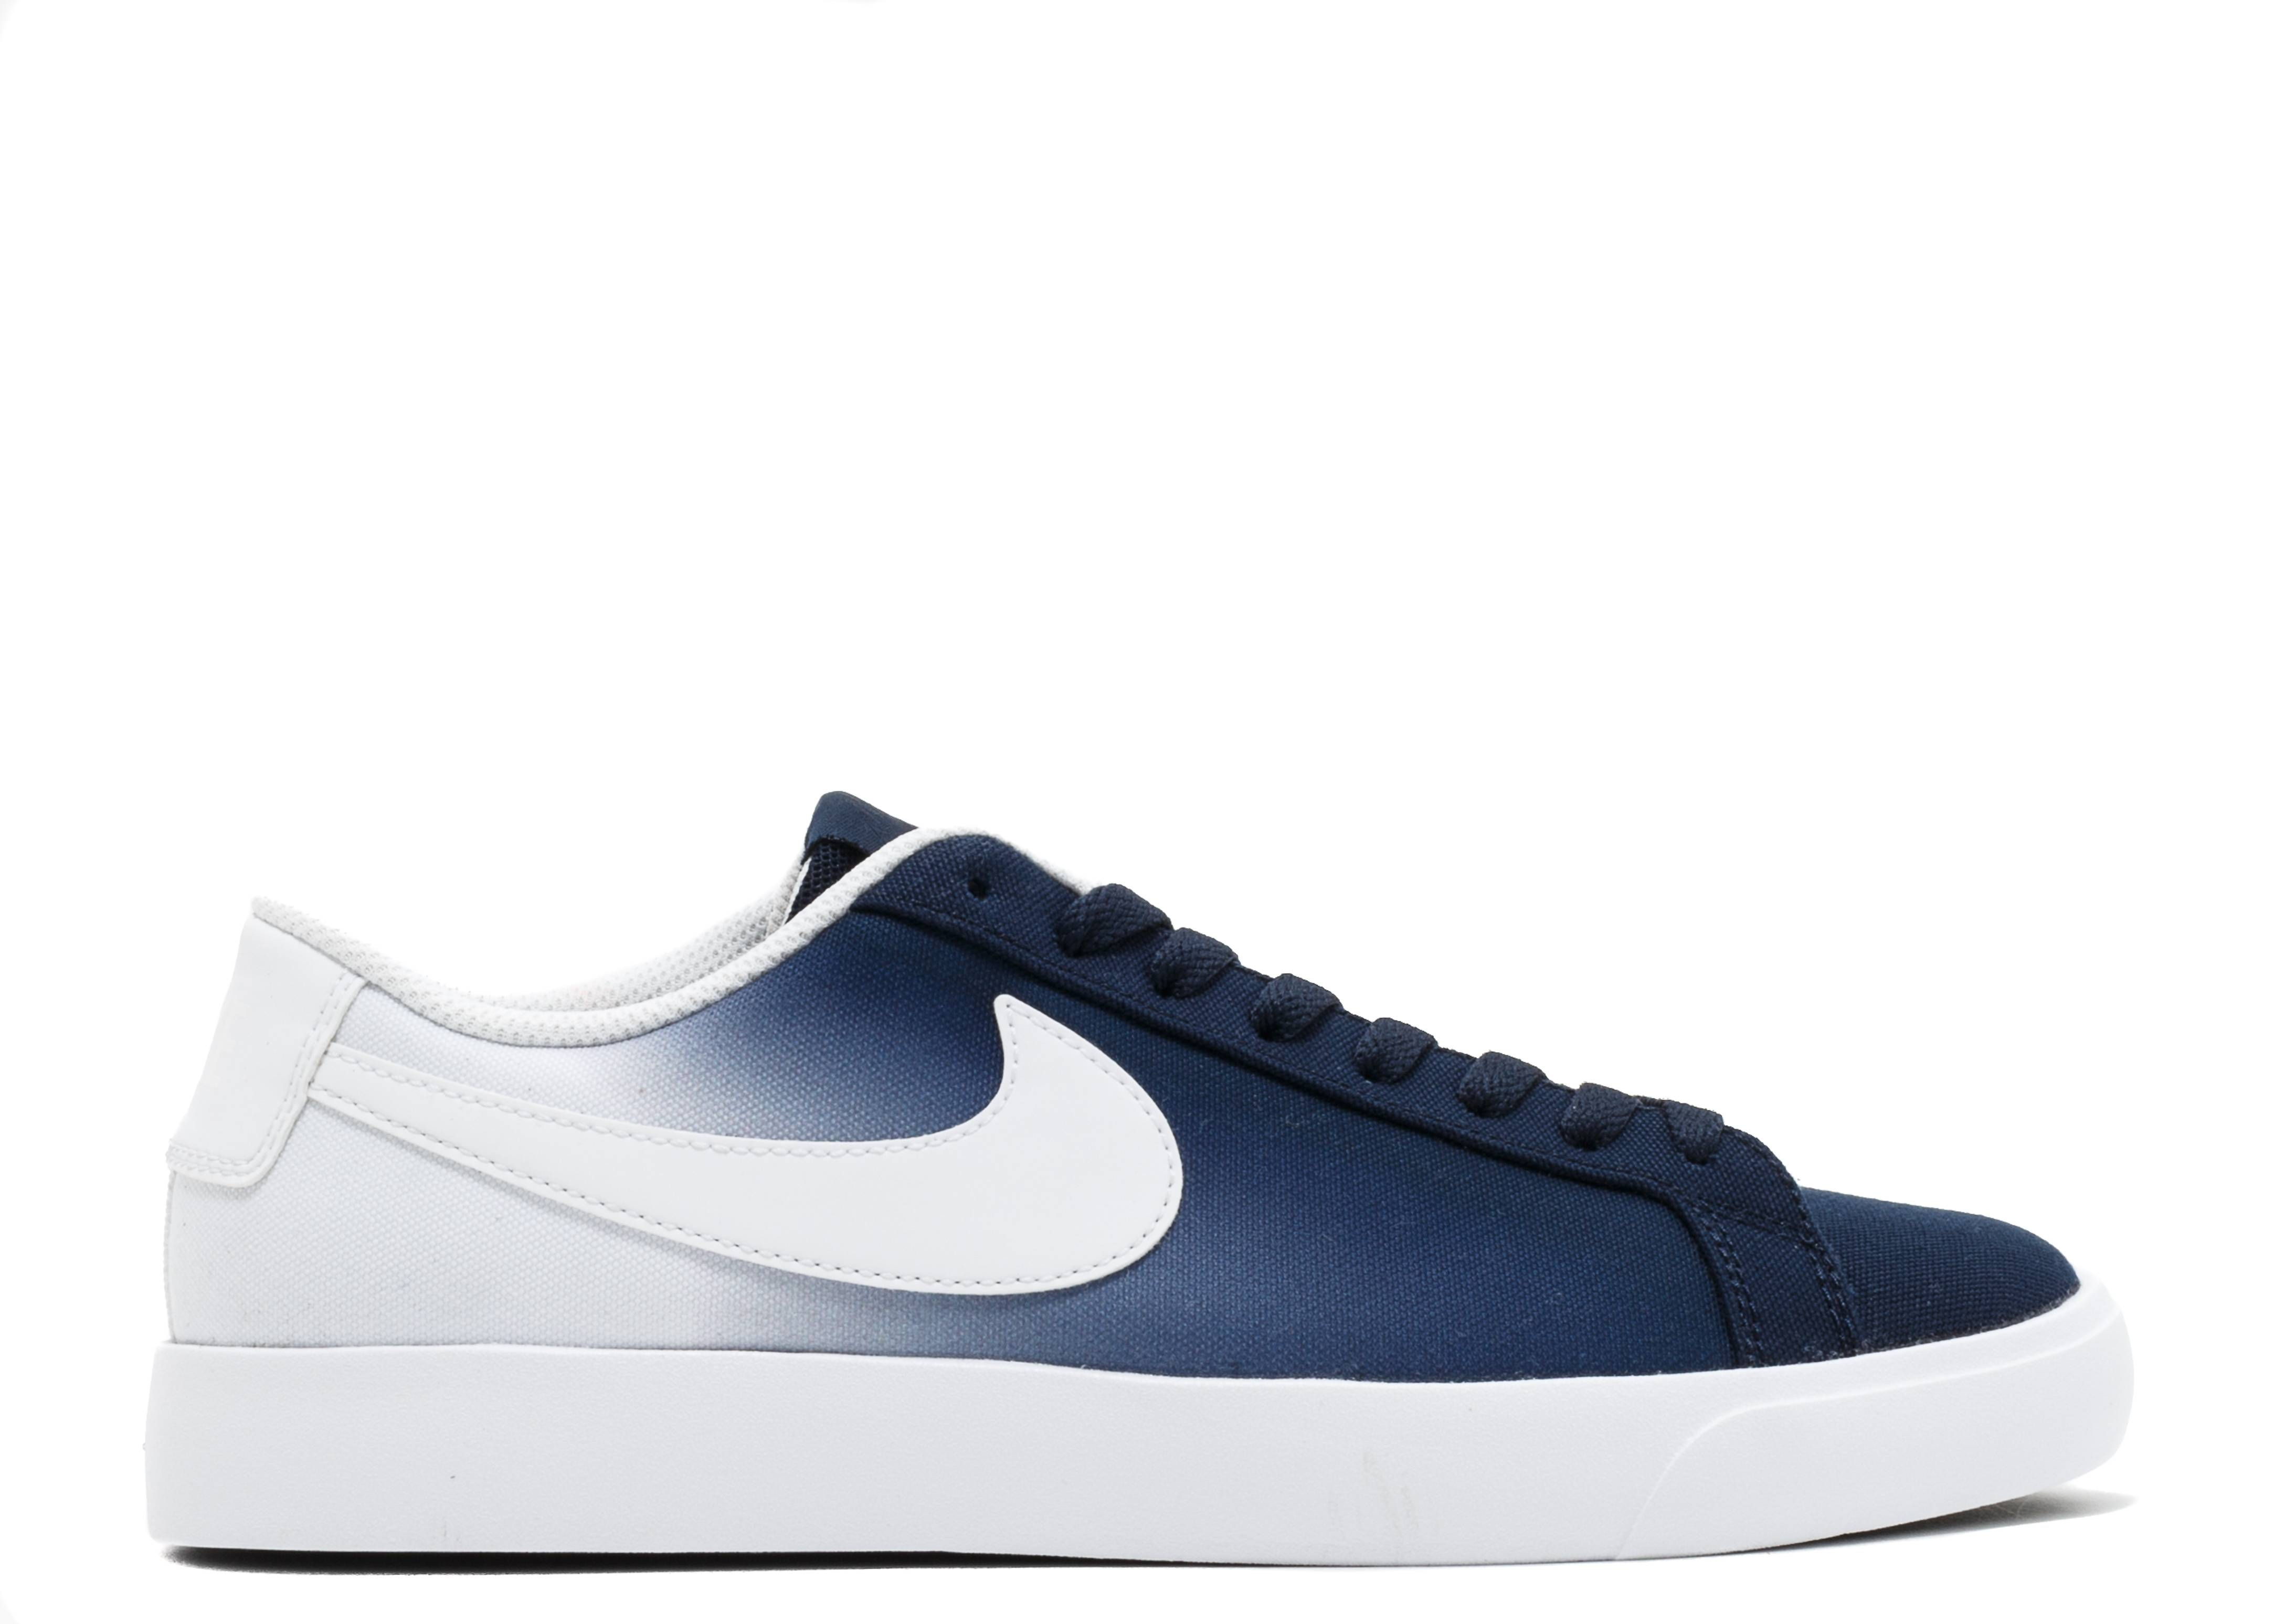 Nike Sb Blazer Vapor Txt - Nike - 902663 411 - obsidian white ... c9797da38